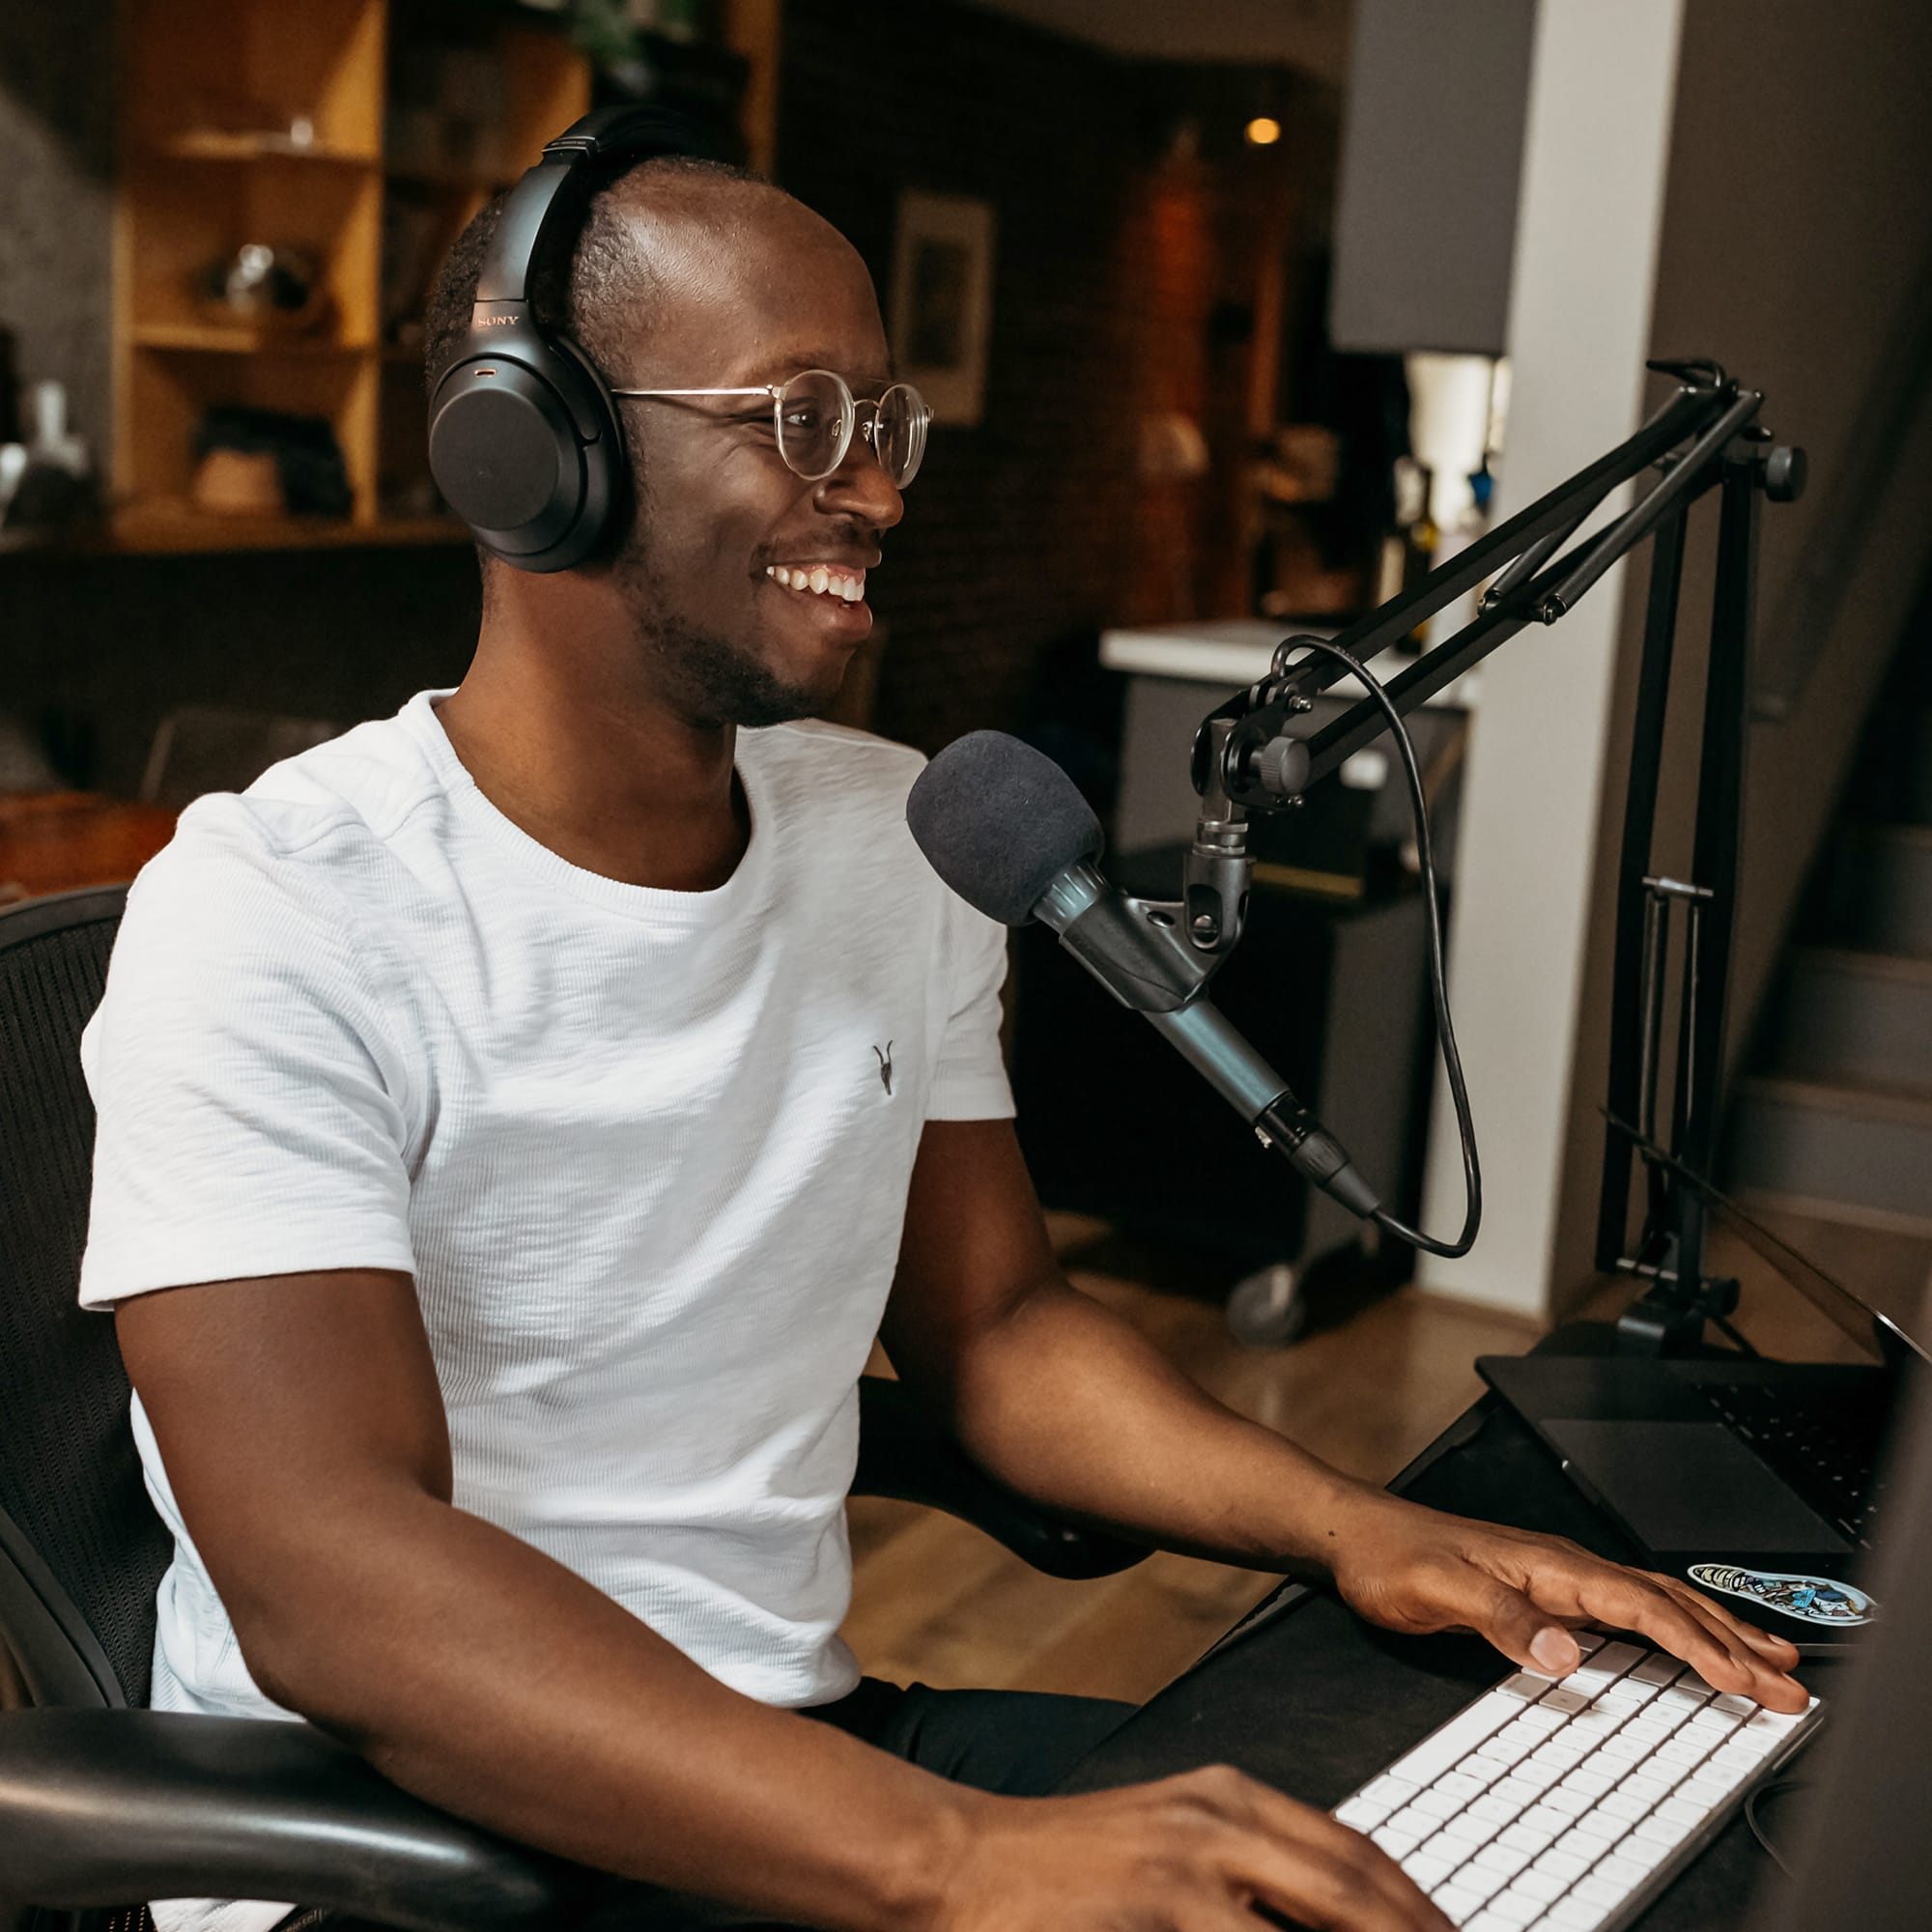 Man podcasting